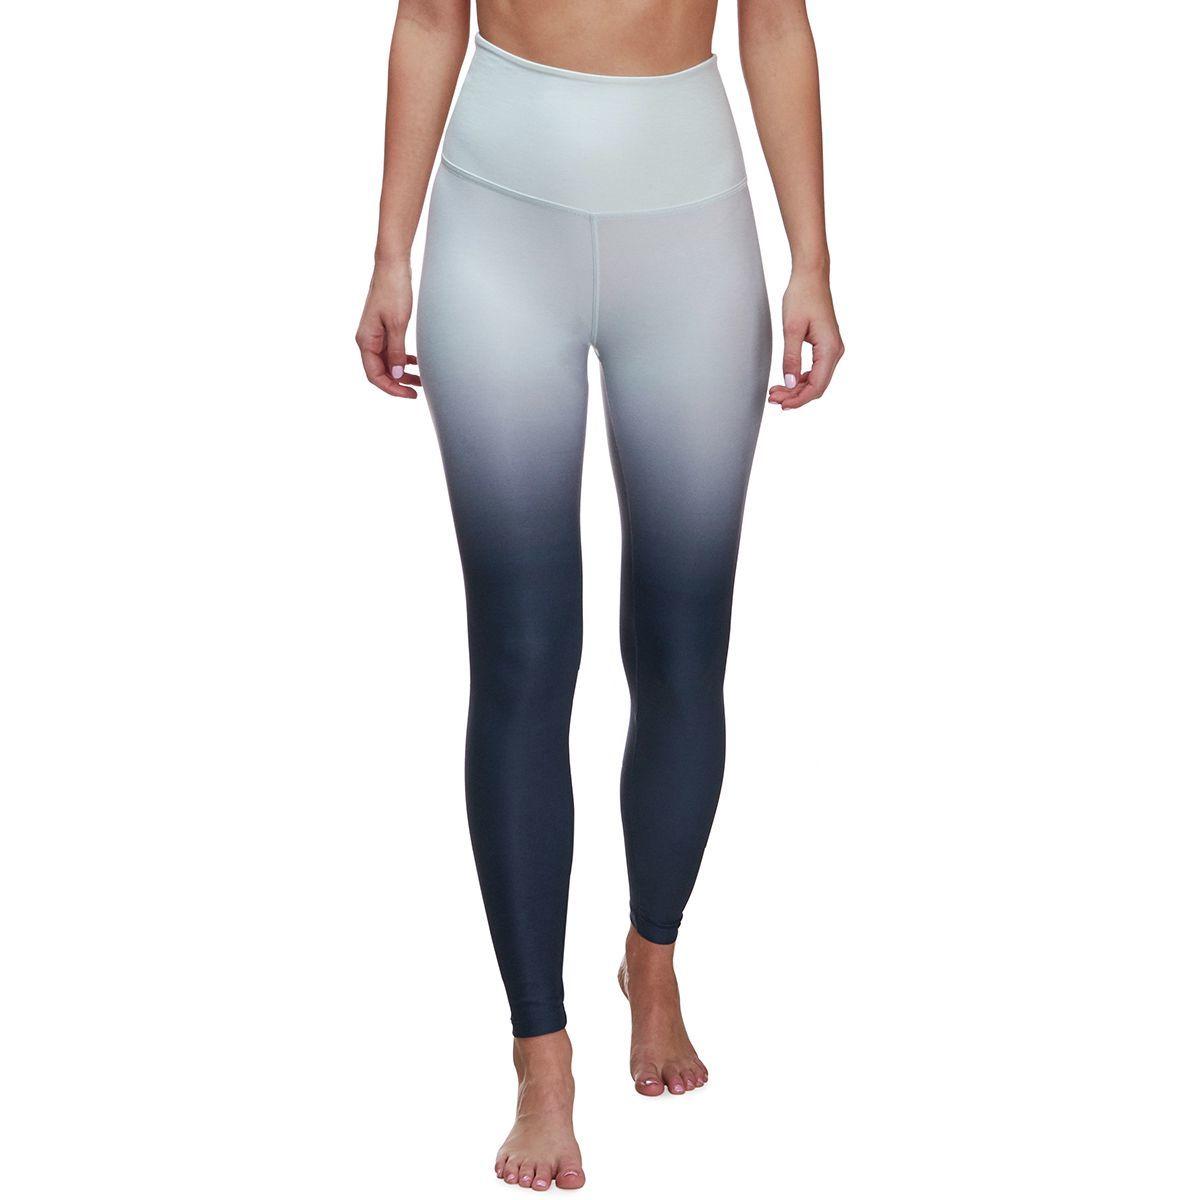 Beyond Yoga Spacedye High Waisted Ombre Midi Legging - Women's